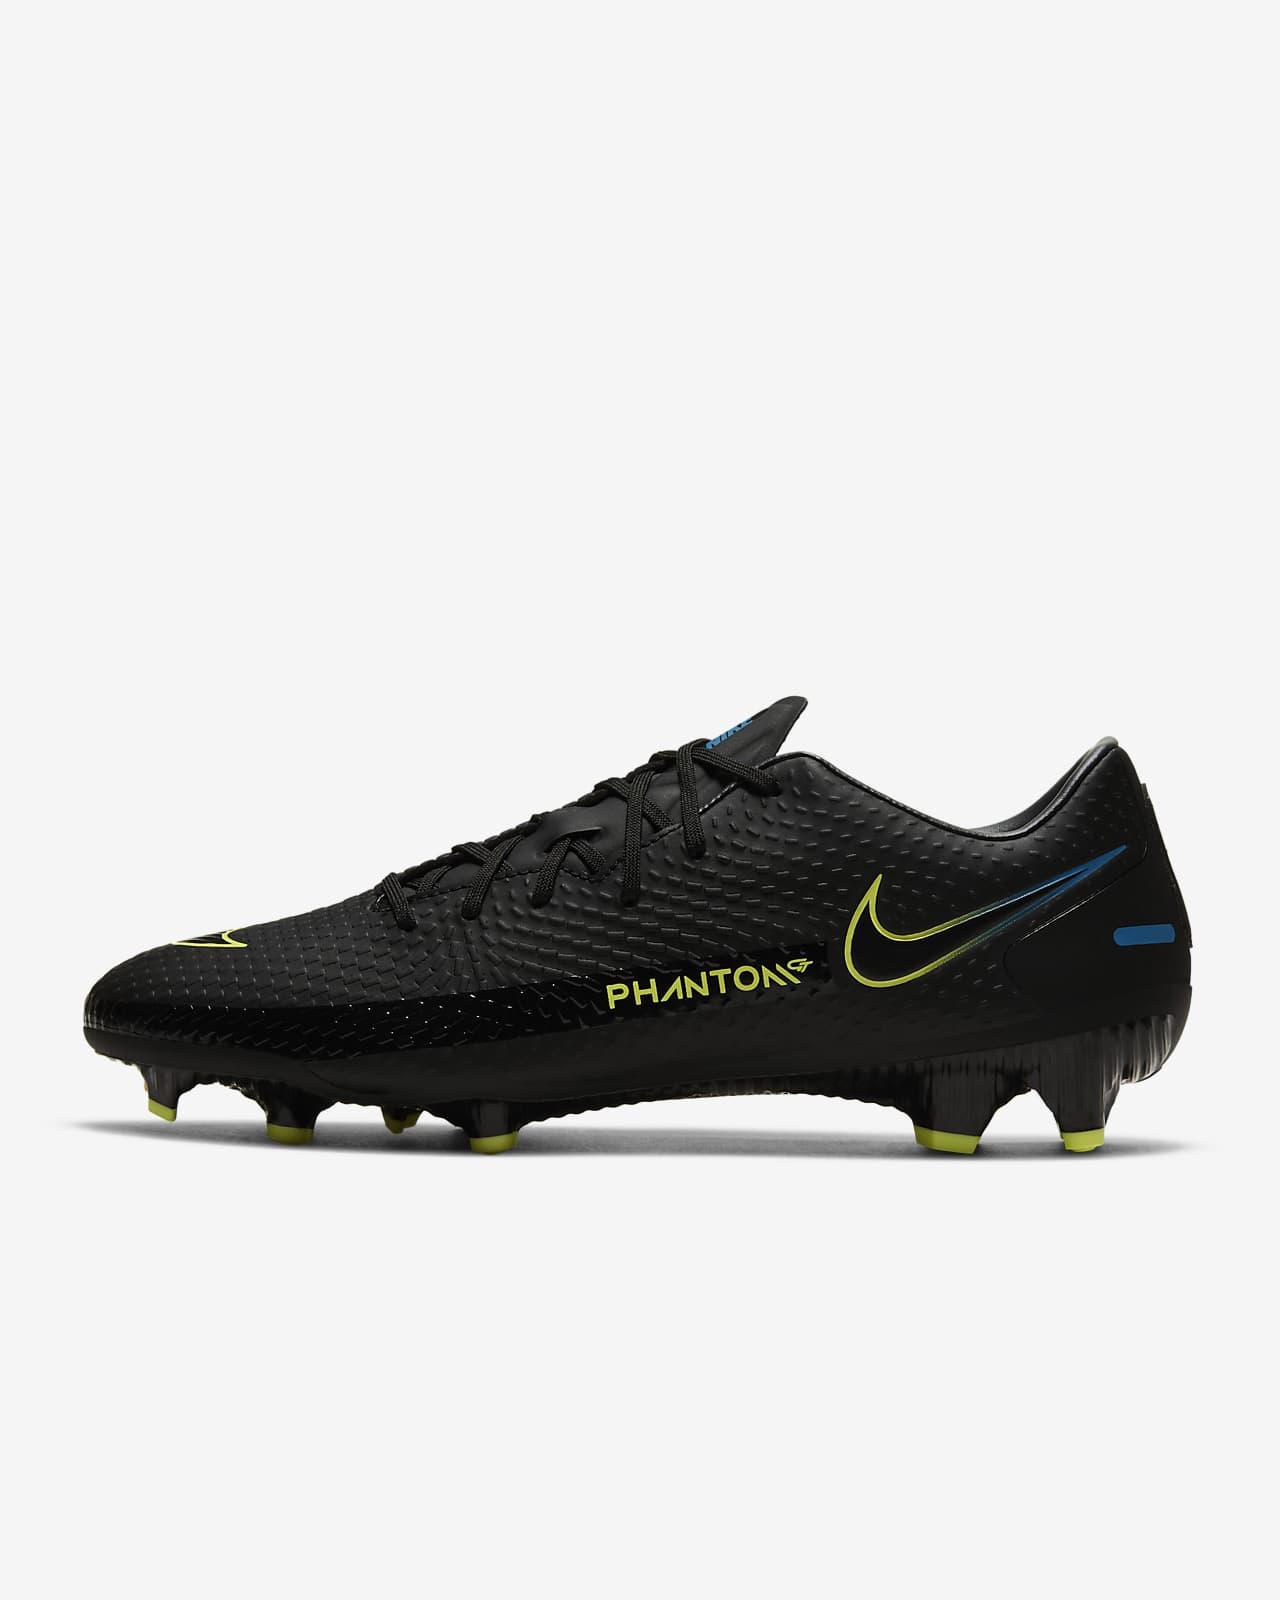 Chaussure de football multi-surfaces à crampons Nike Phantom GT Academy MG